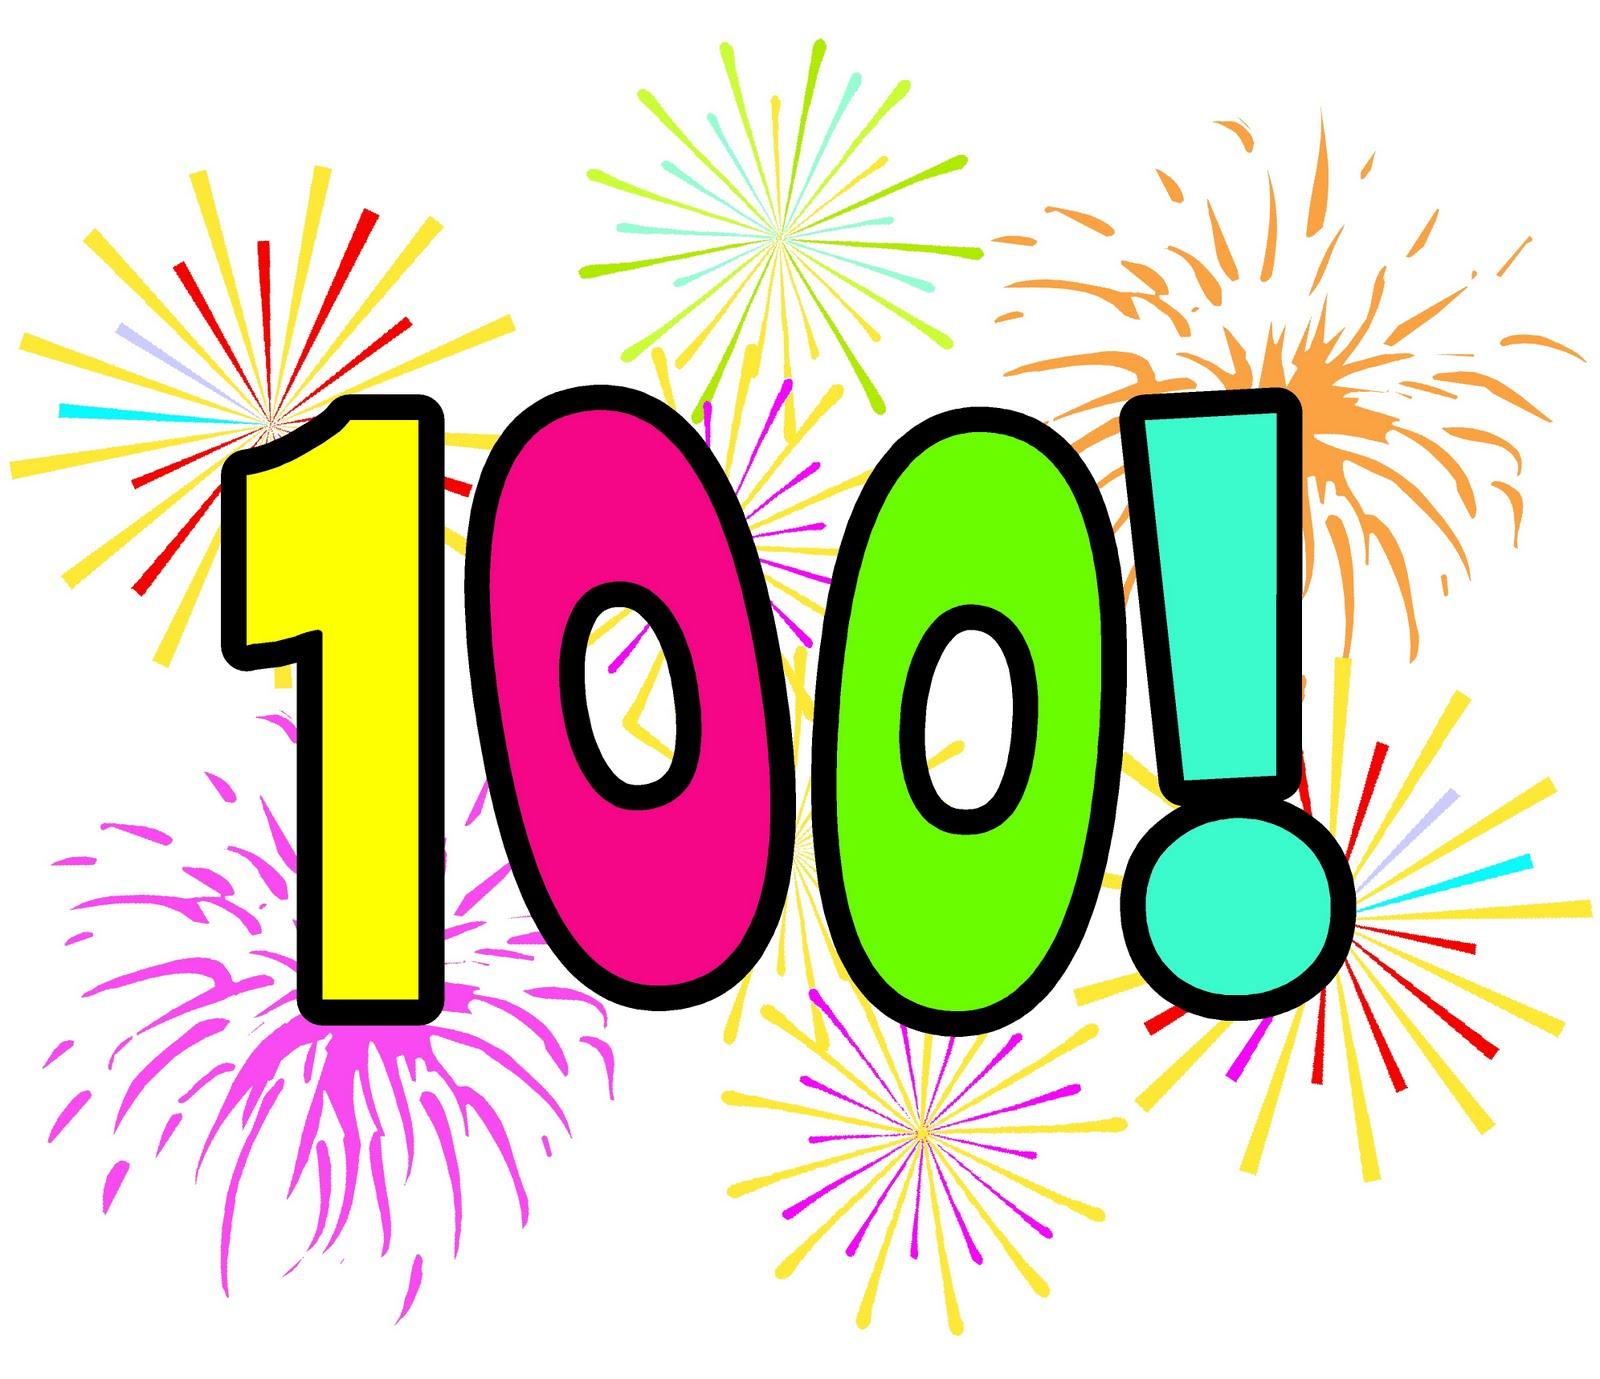 so-dem-trong-tieng-anh-tu-100-den-1000